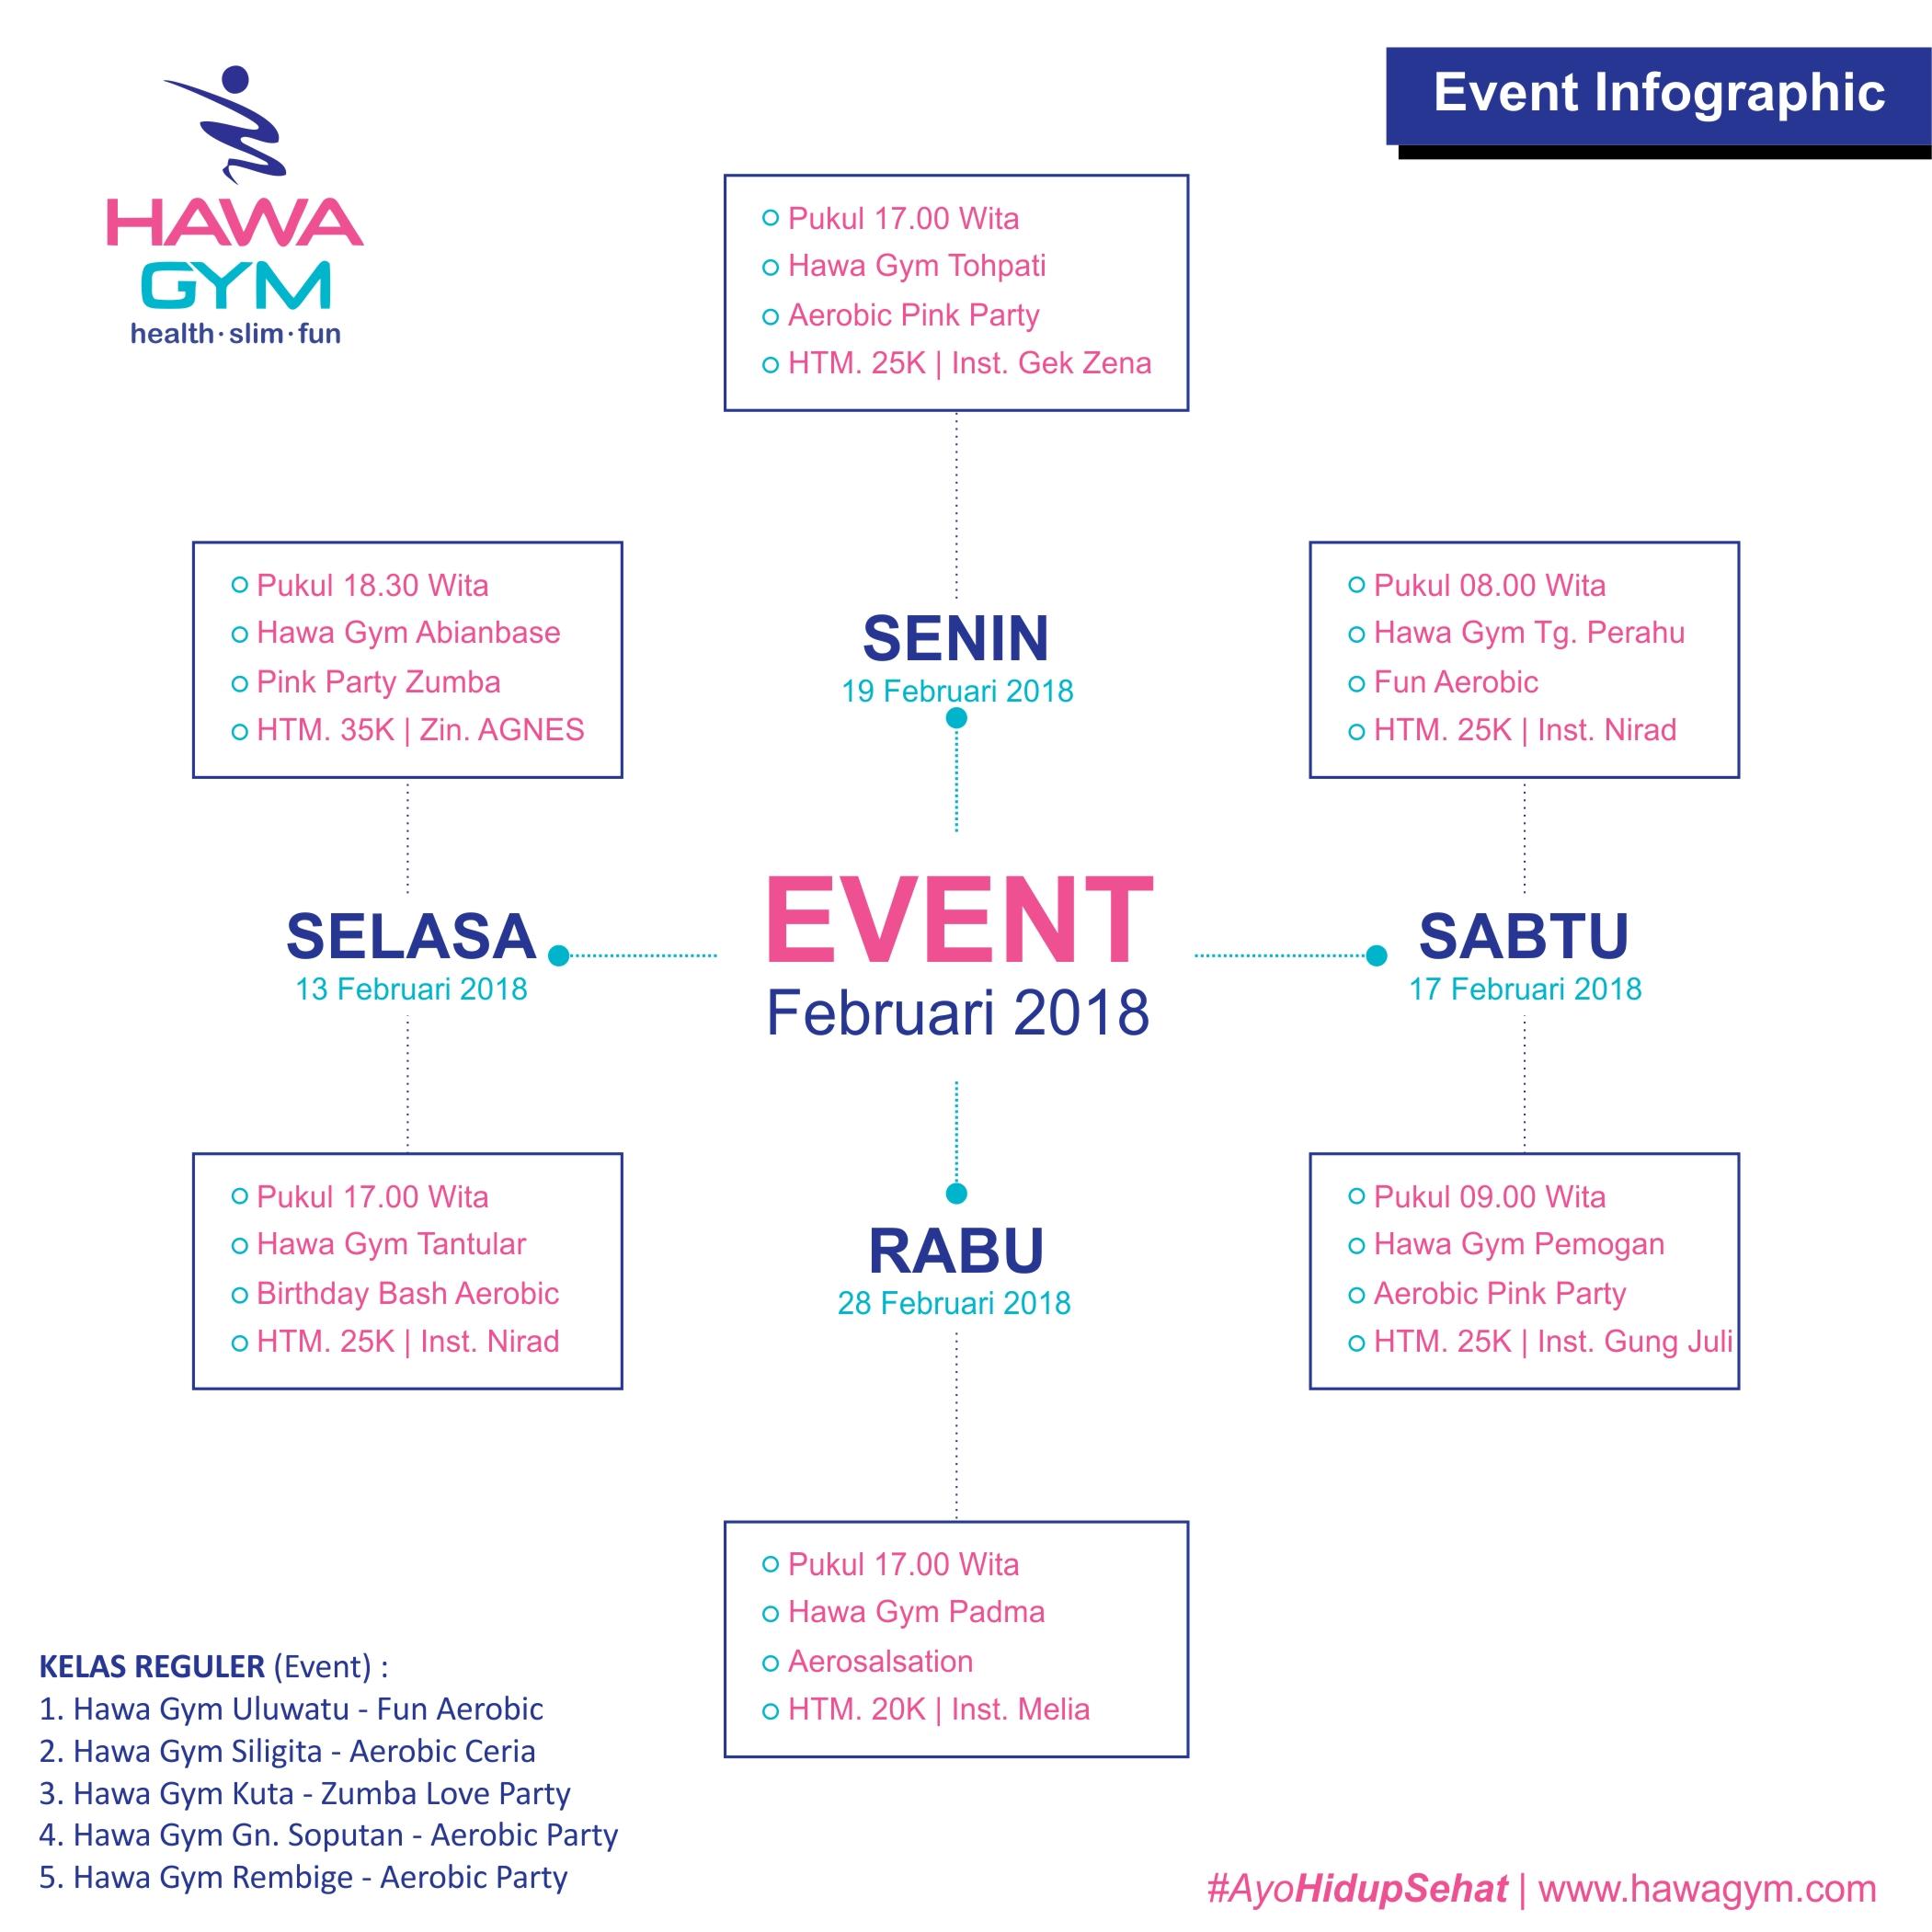 infografis-hawagym-indonesia-event-februari-2018